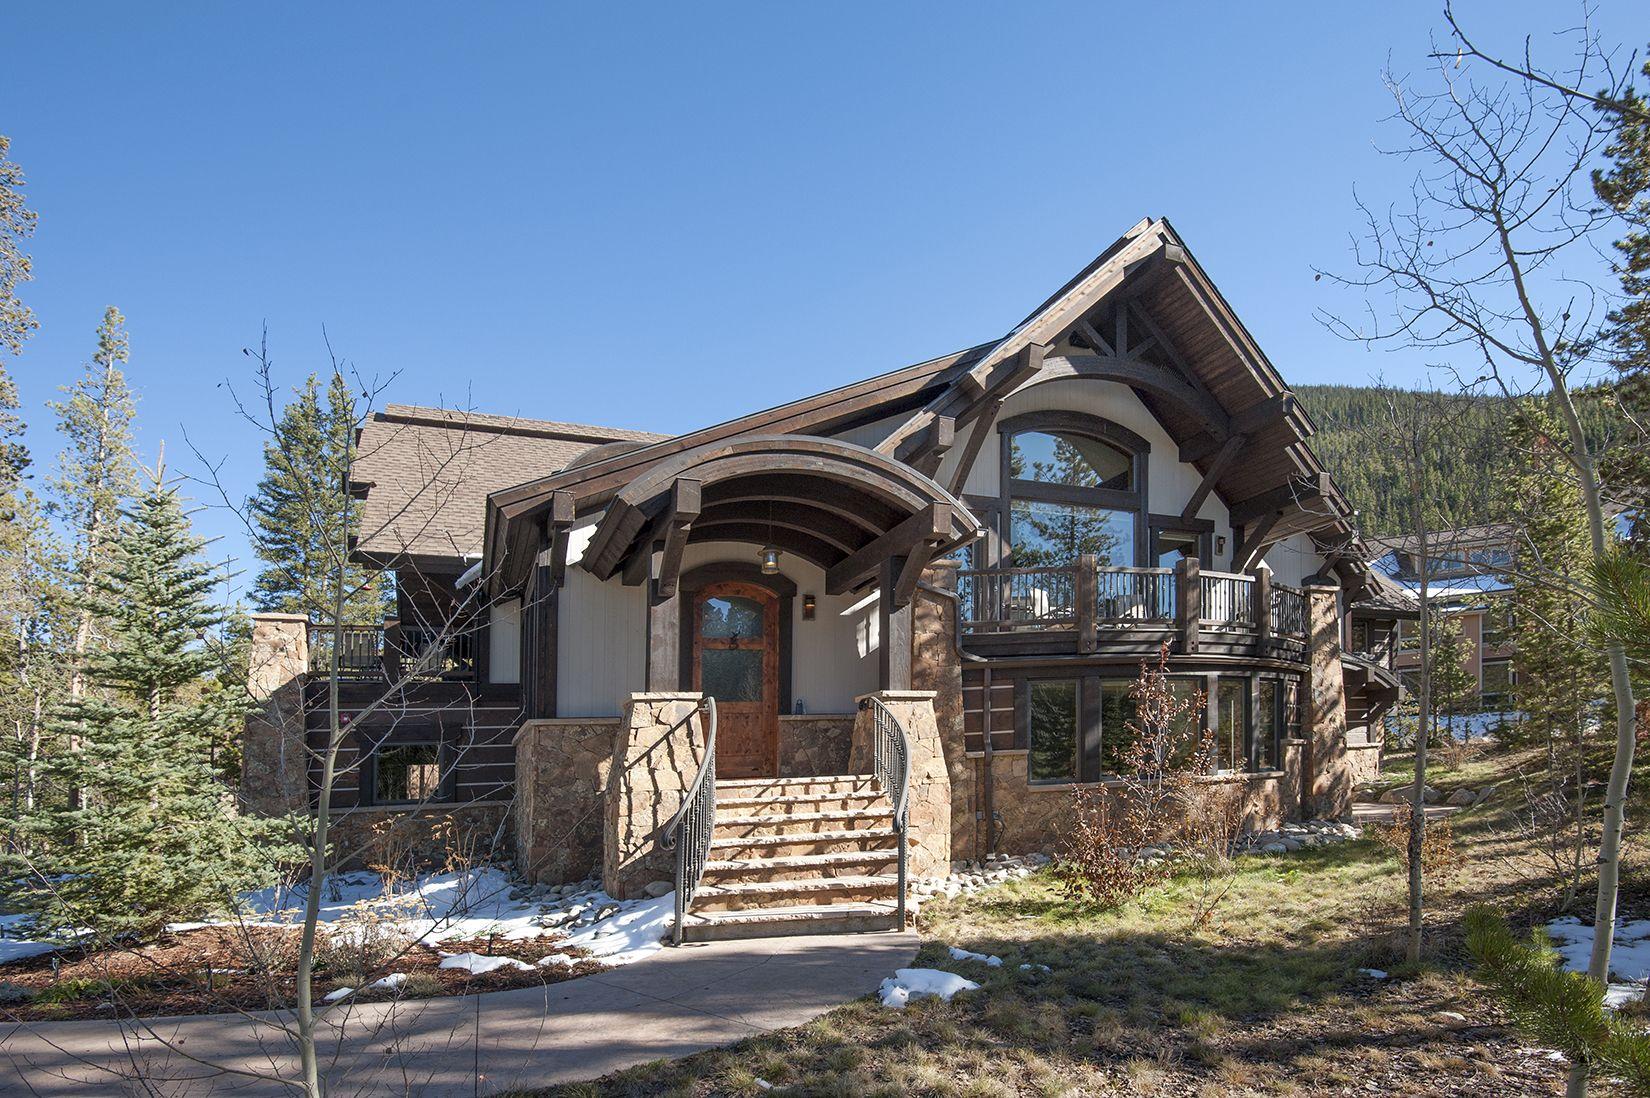 10 WOLF ROCK ROAD KEYSTONE, Colorado 80435